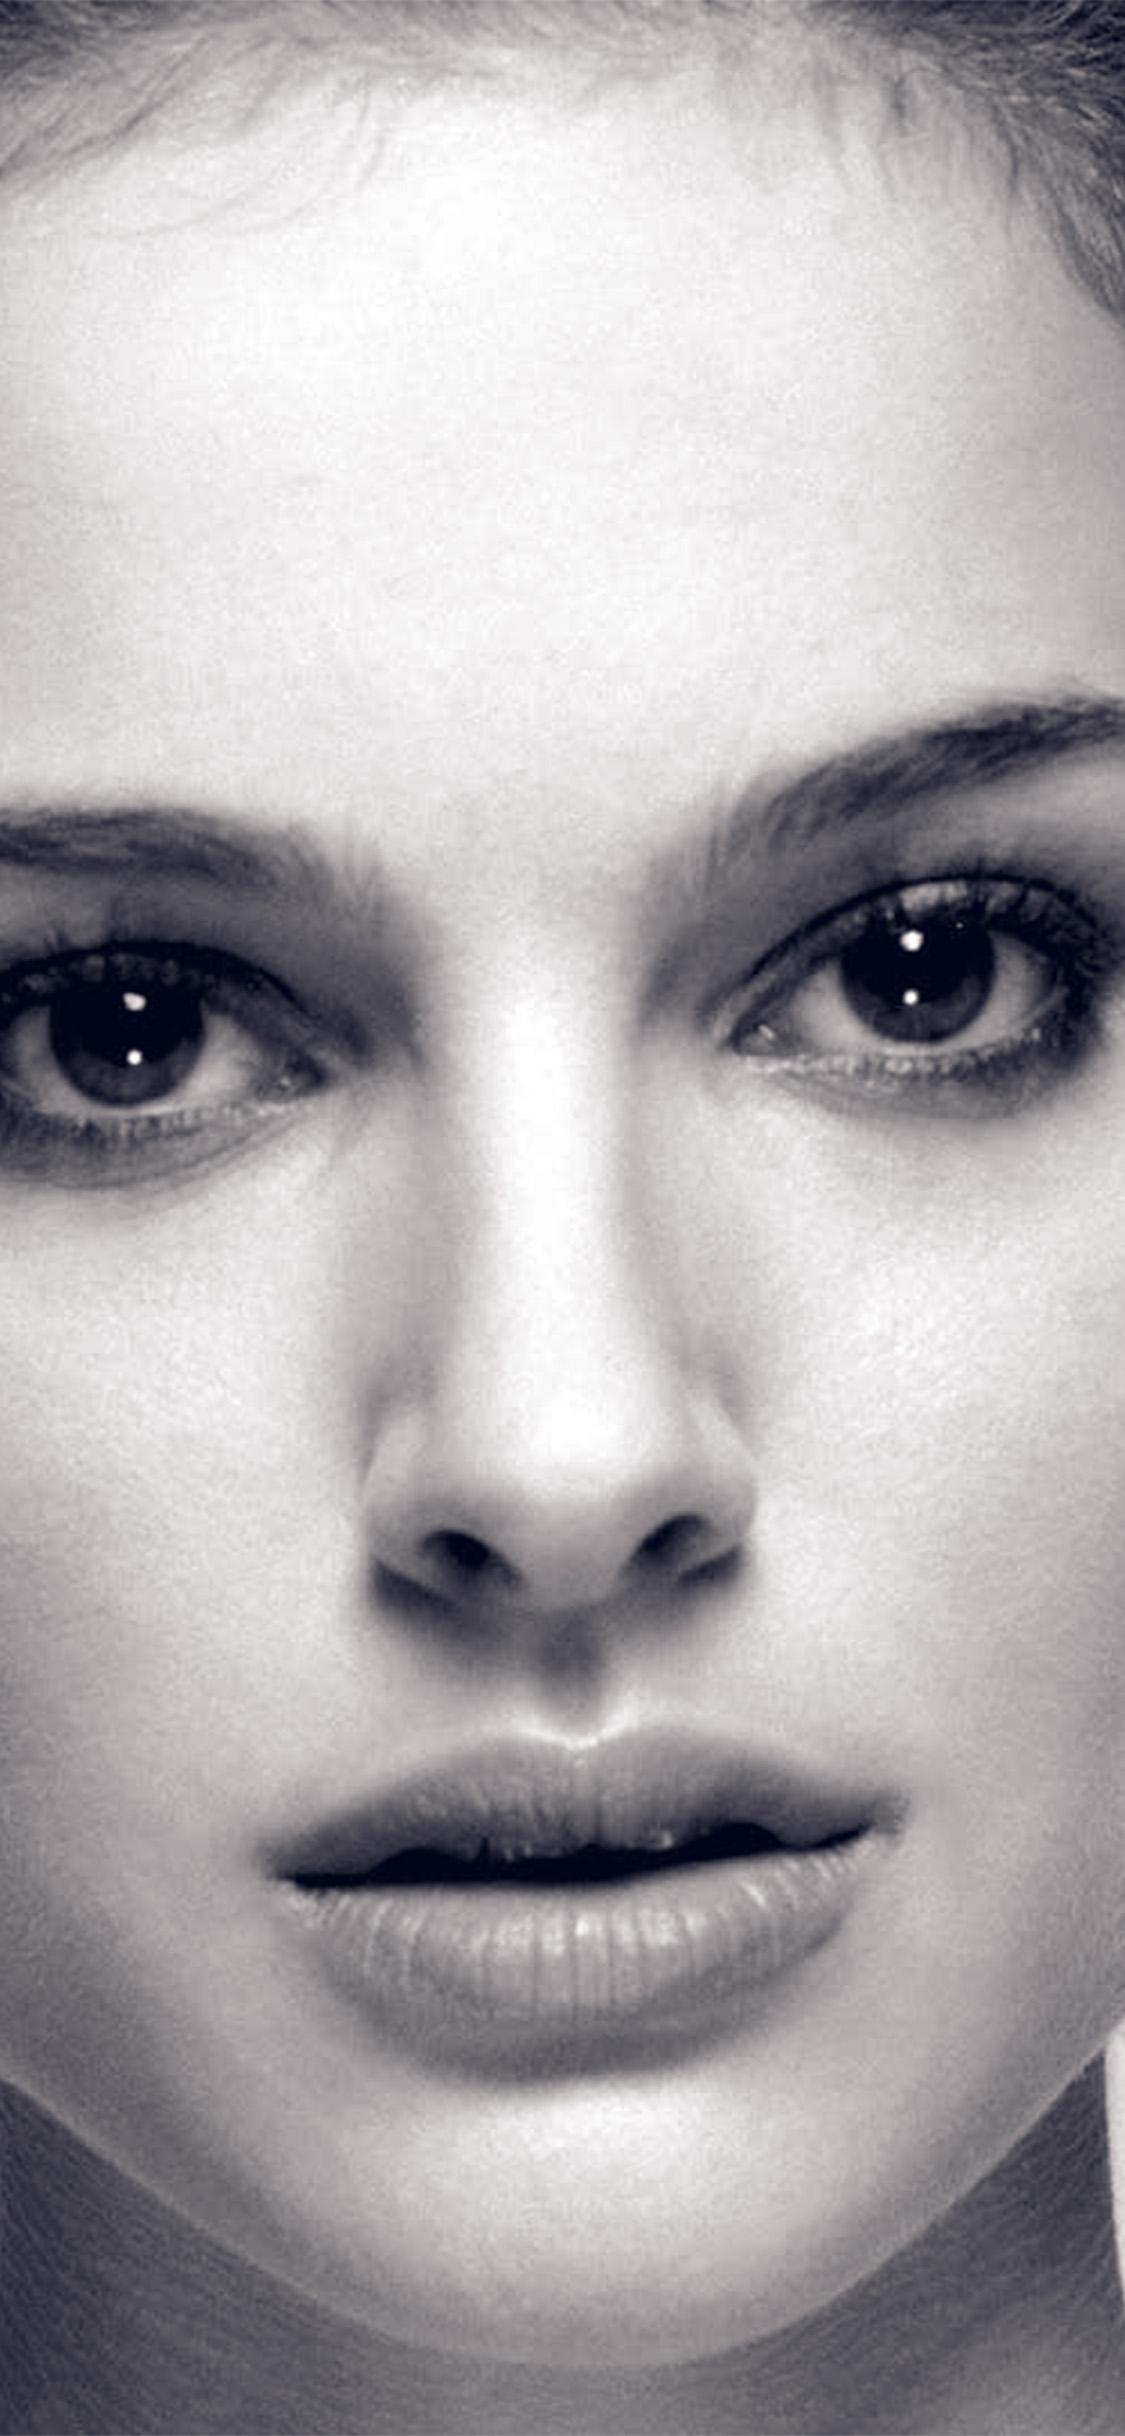 iPhonexpapers.com-Apple-iPhone-wallpaper-ho50-natalie-portman-film-girl-actress